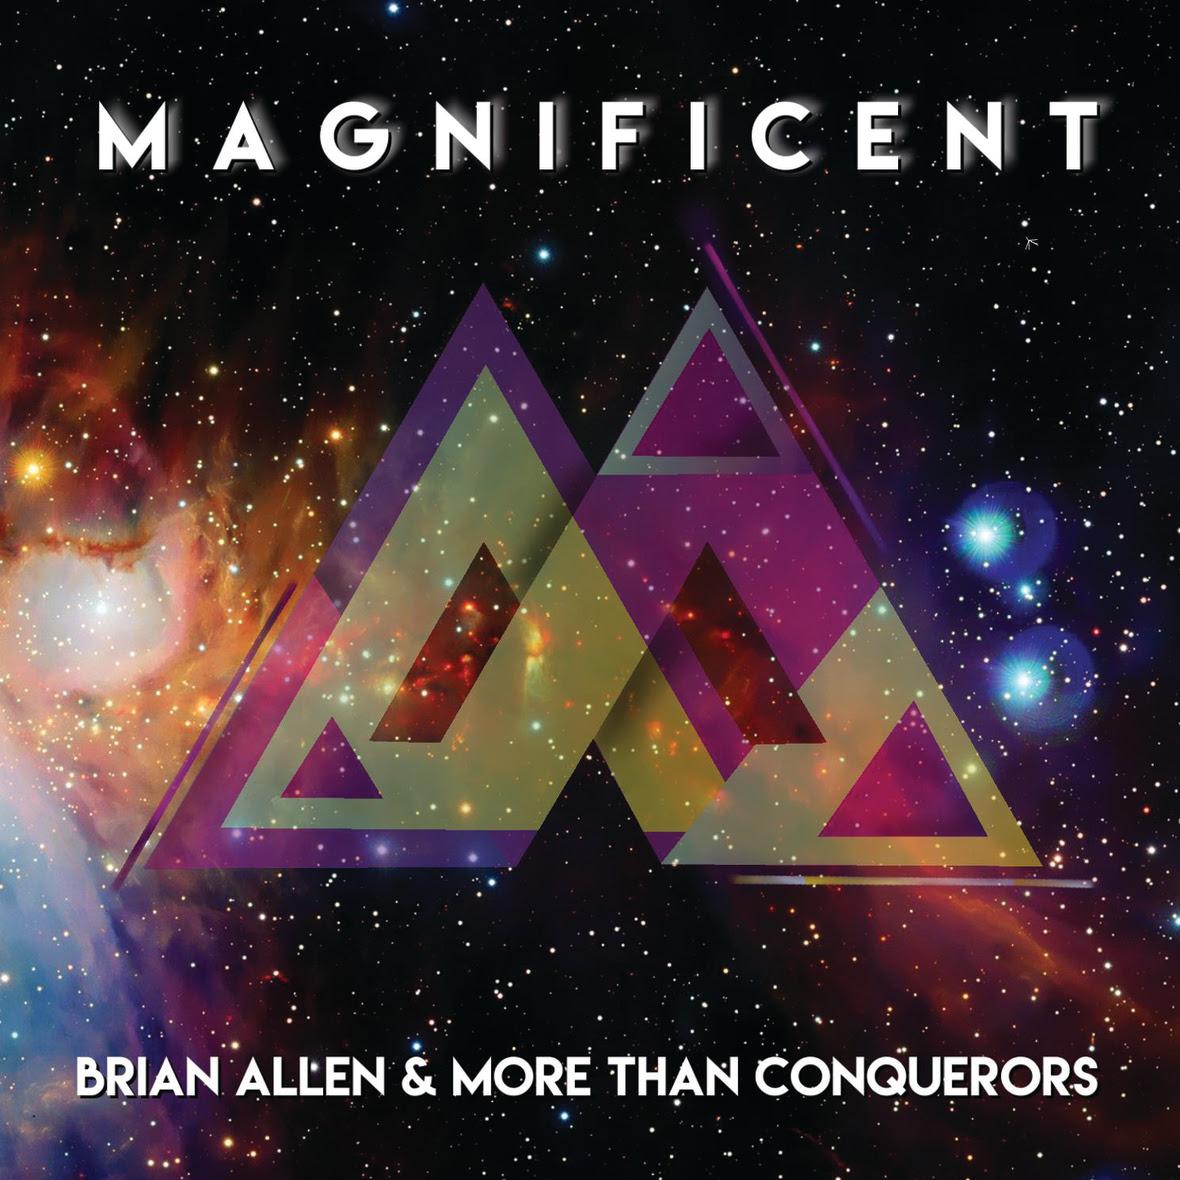 Singer Brian Allen releases 'Magnificent' album